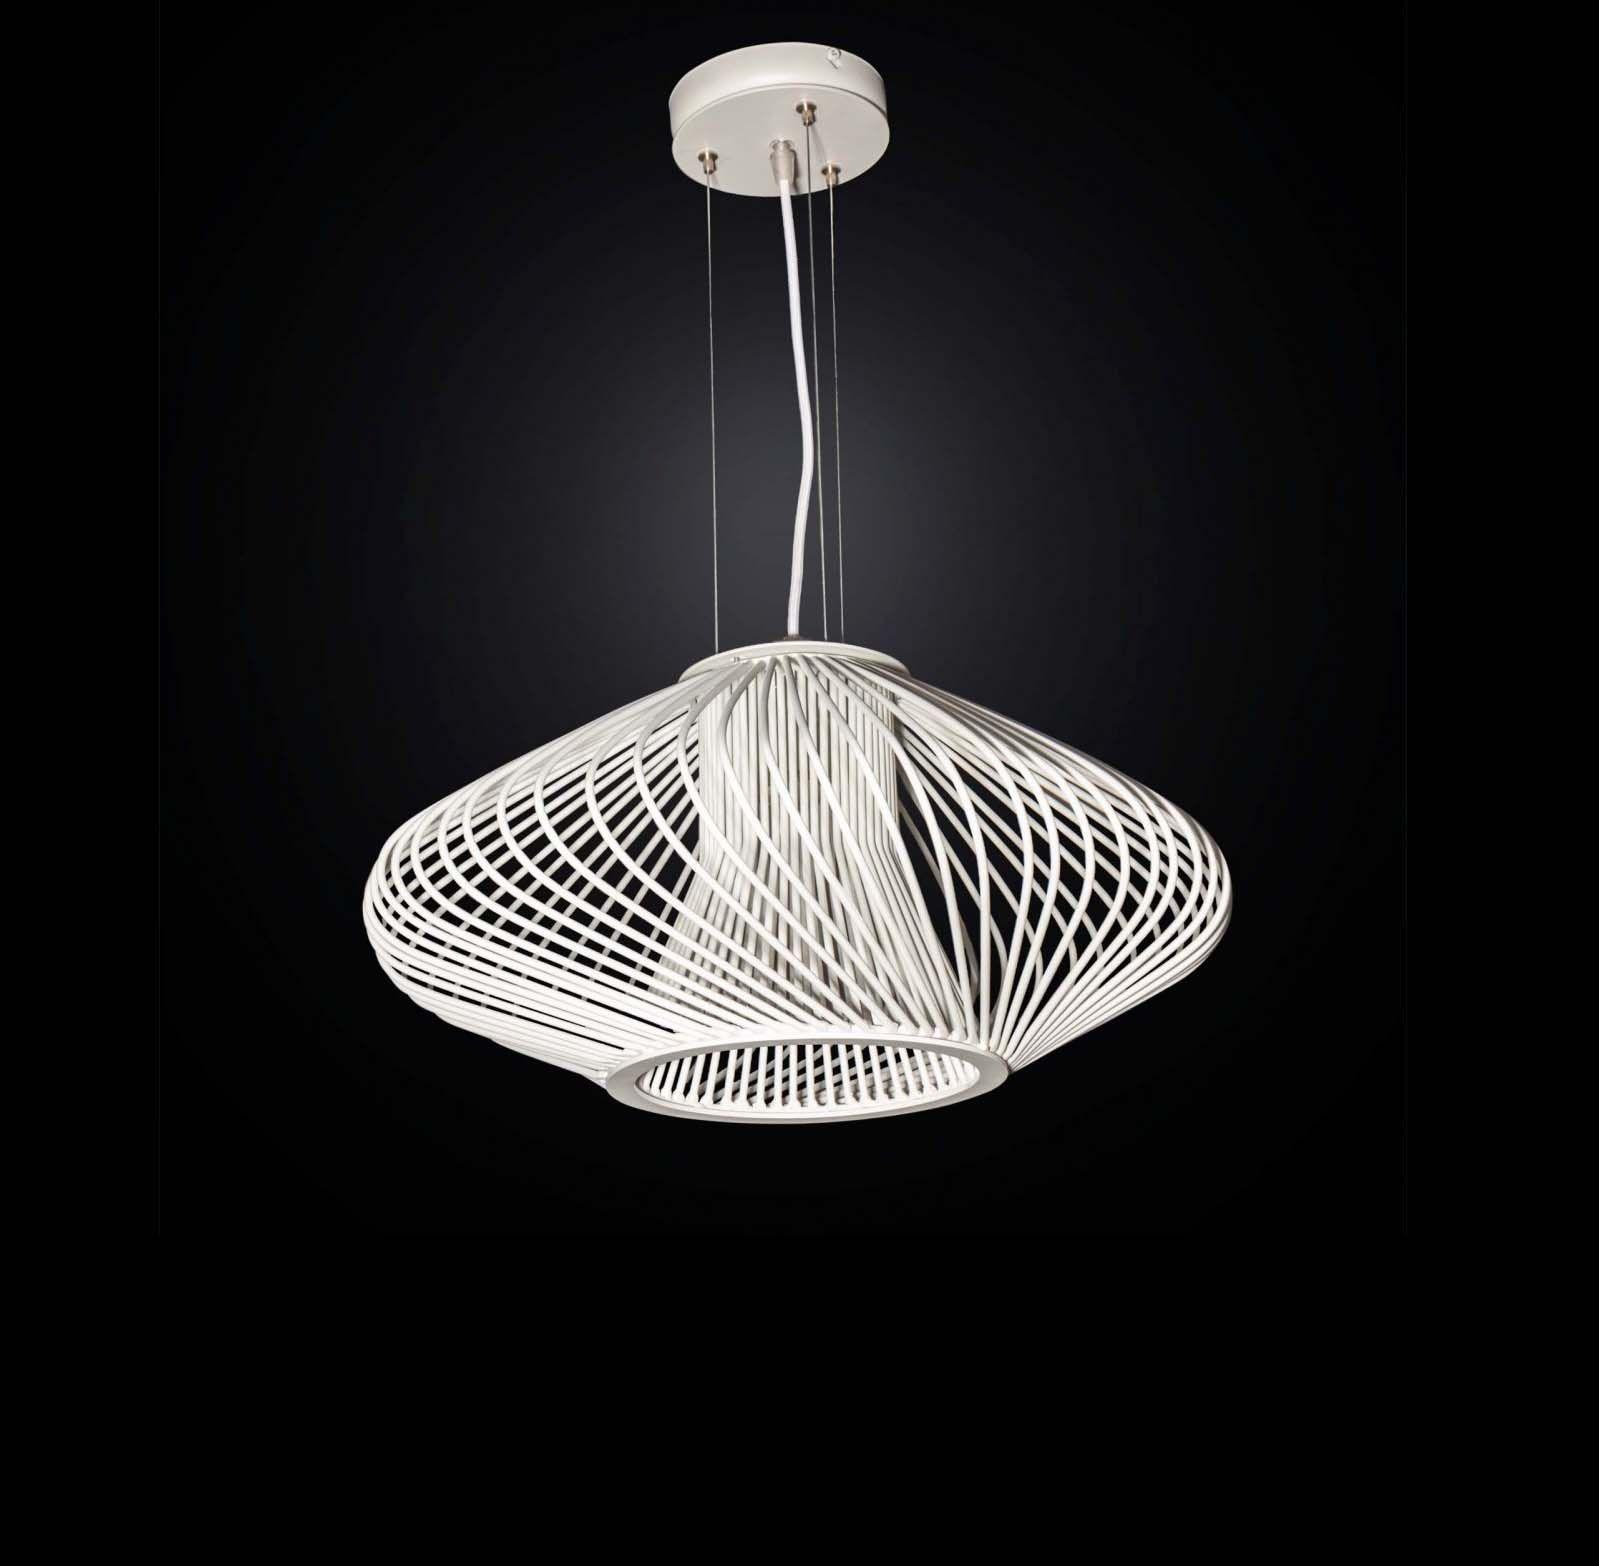 Lampadario Moderno Design.Lampadario Moderno Design Bianco Sfera A 5 Luci Bga 3026 S50